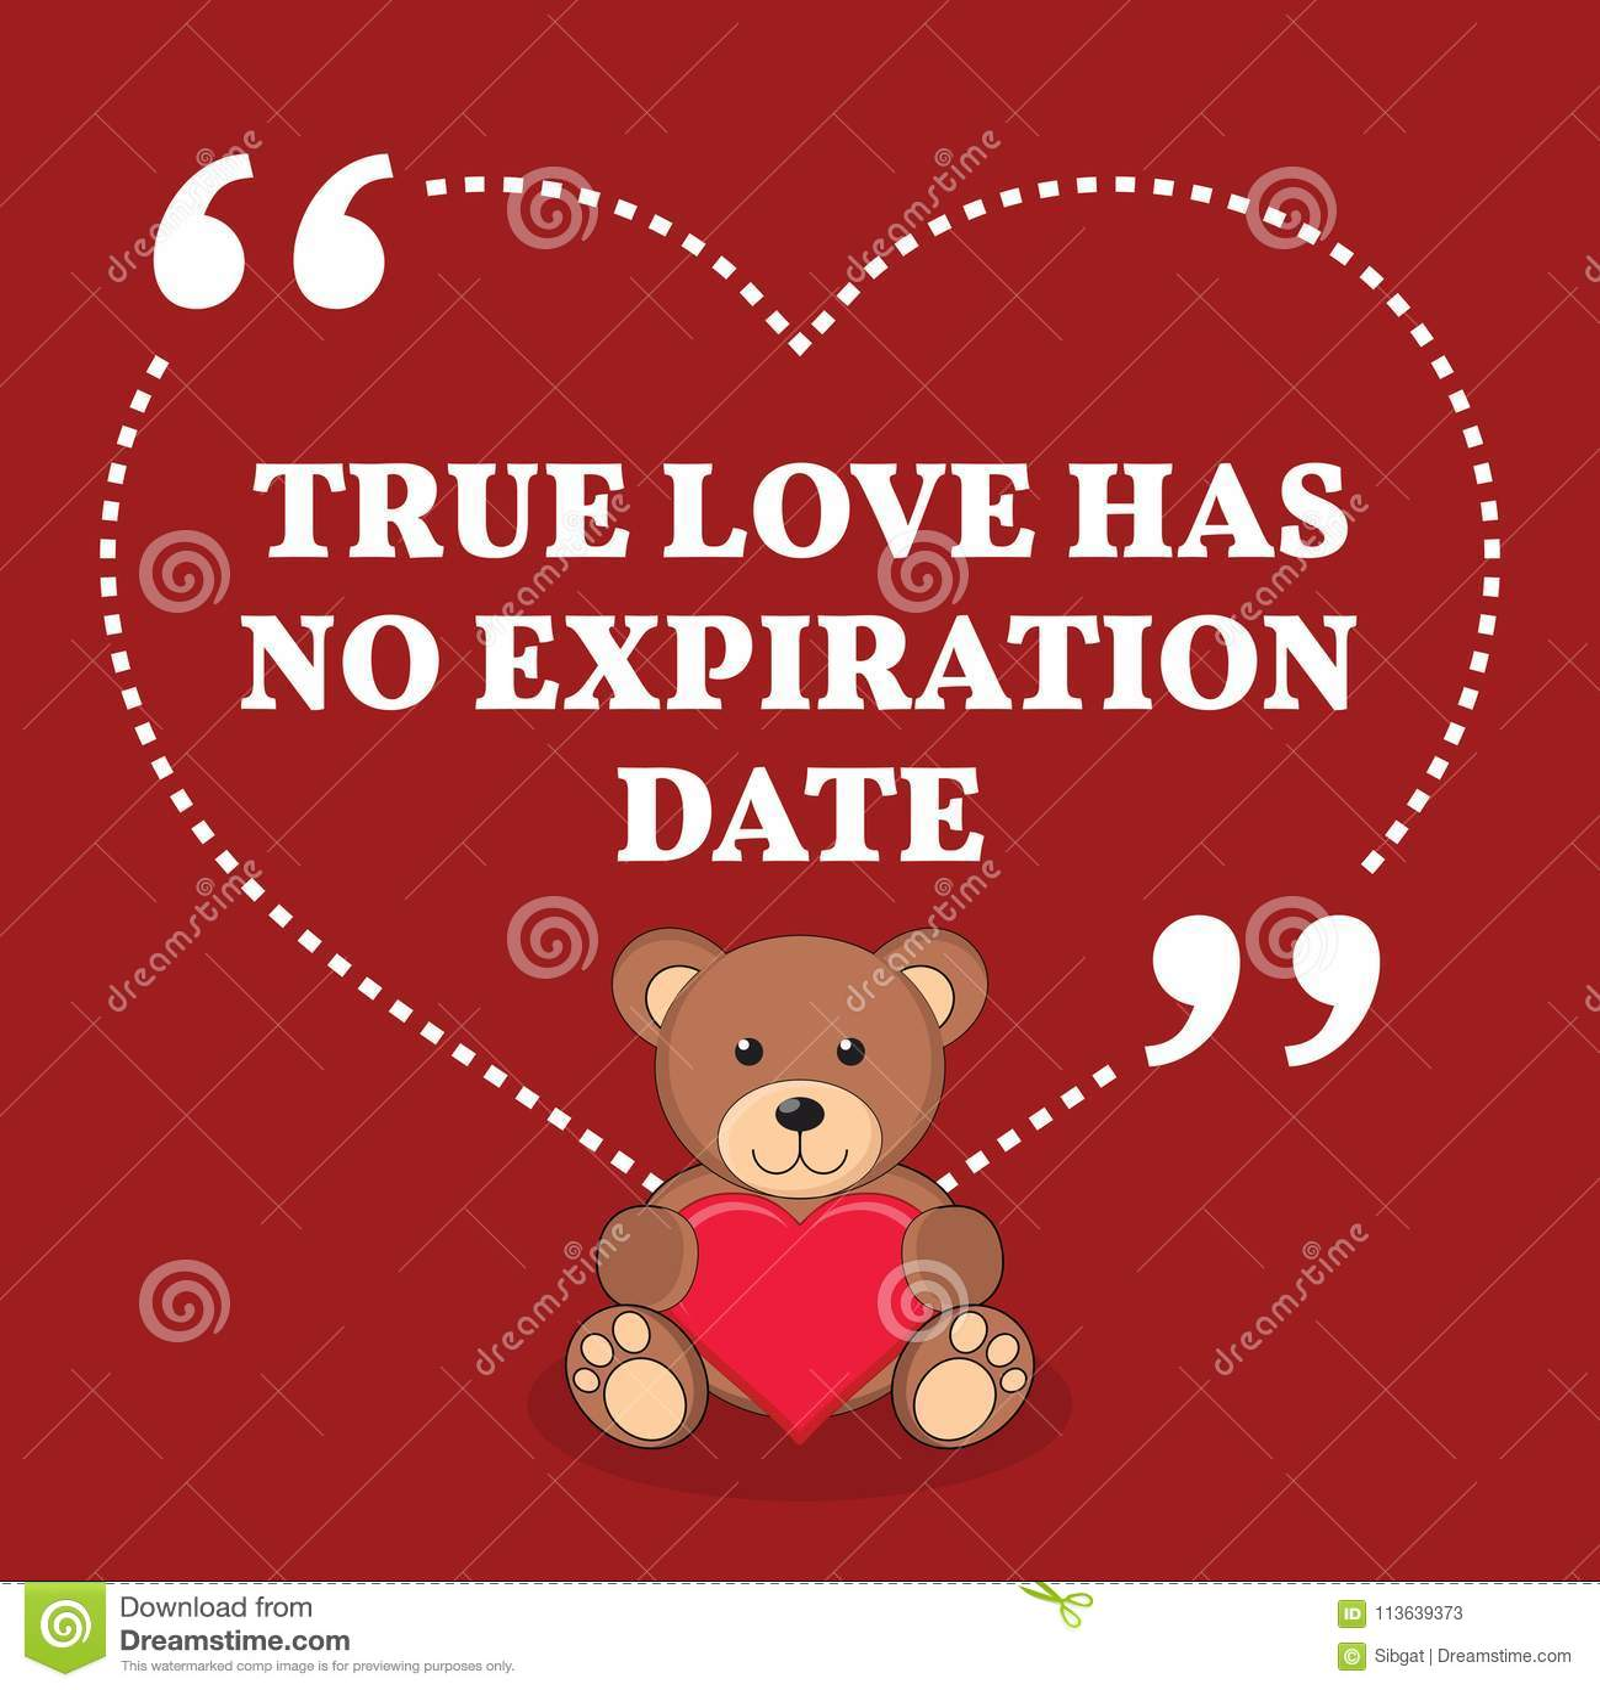 16Photos Proving That True Love Has NoExpiration Date